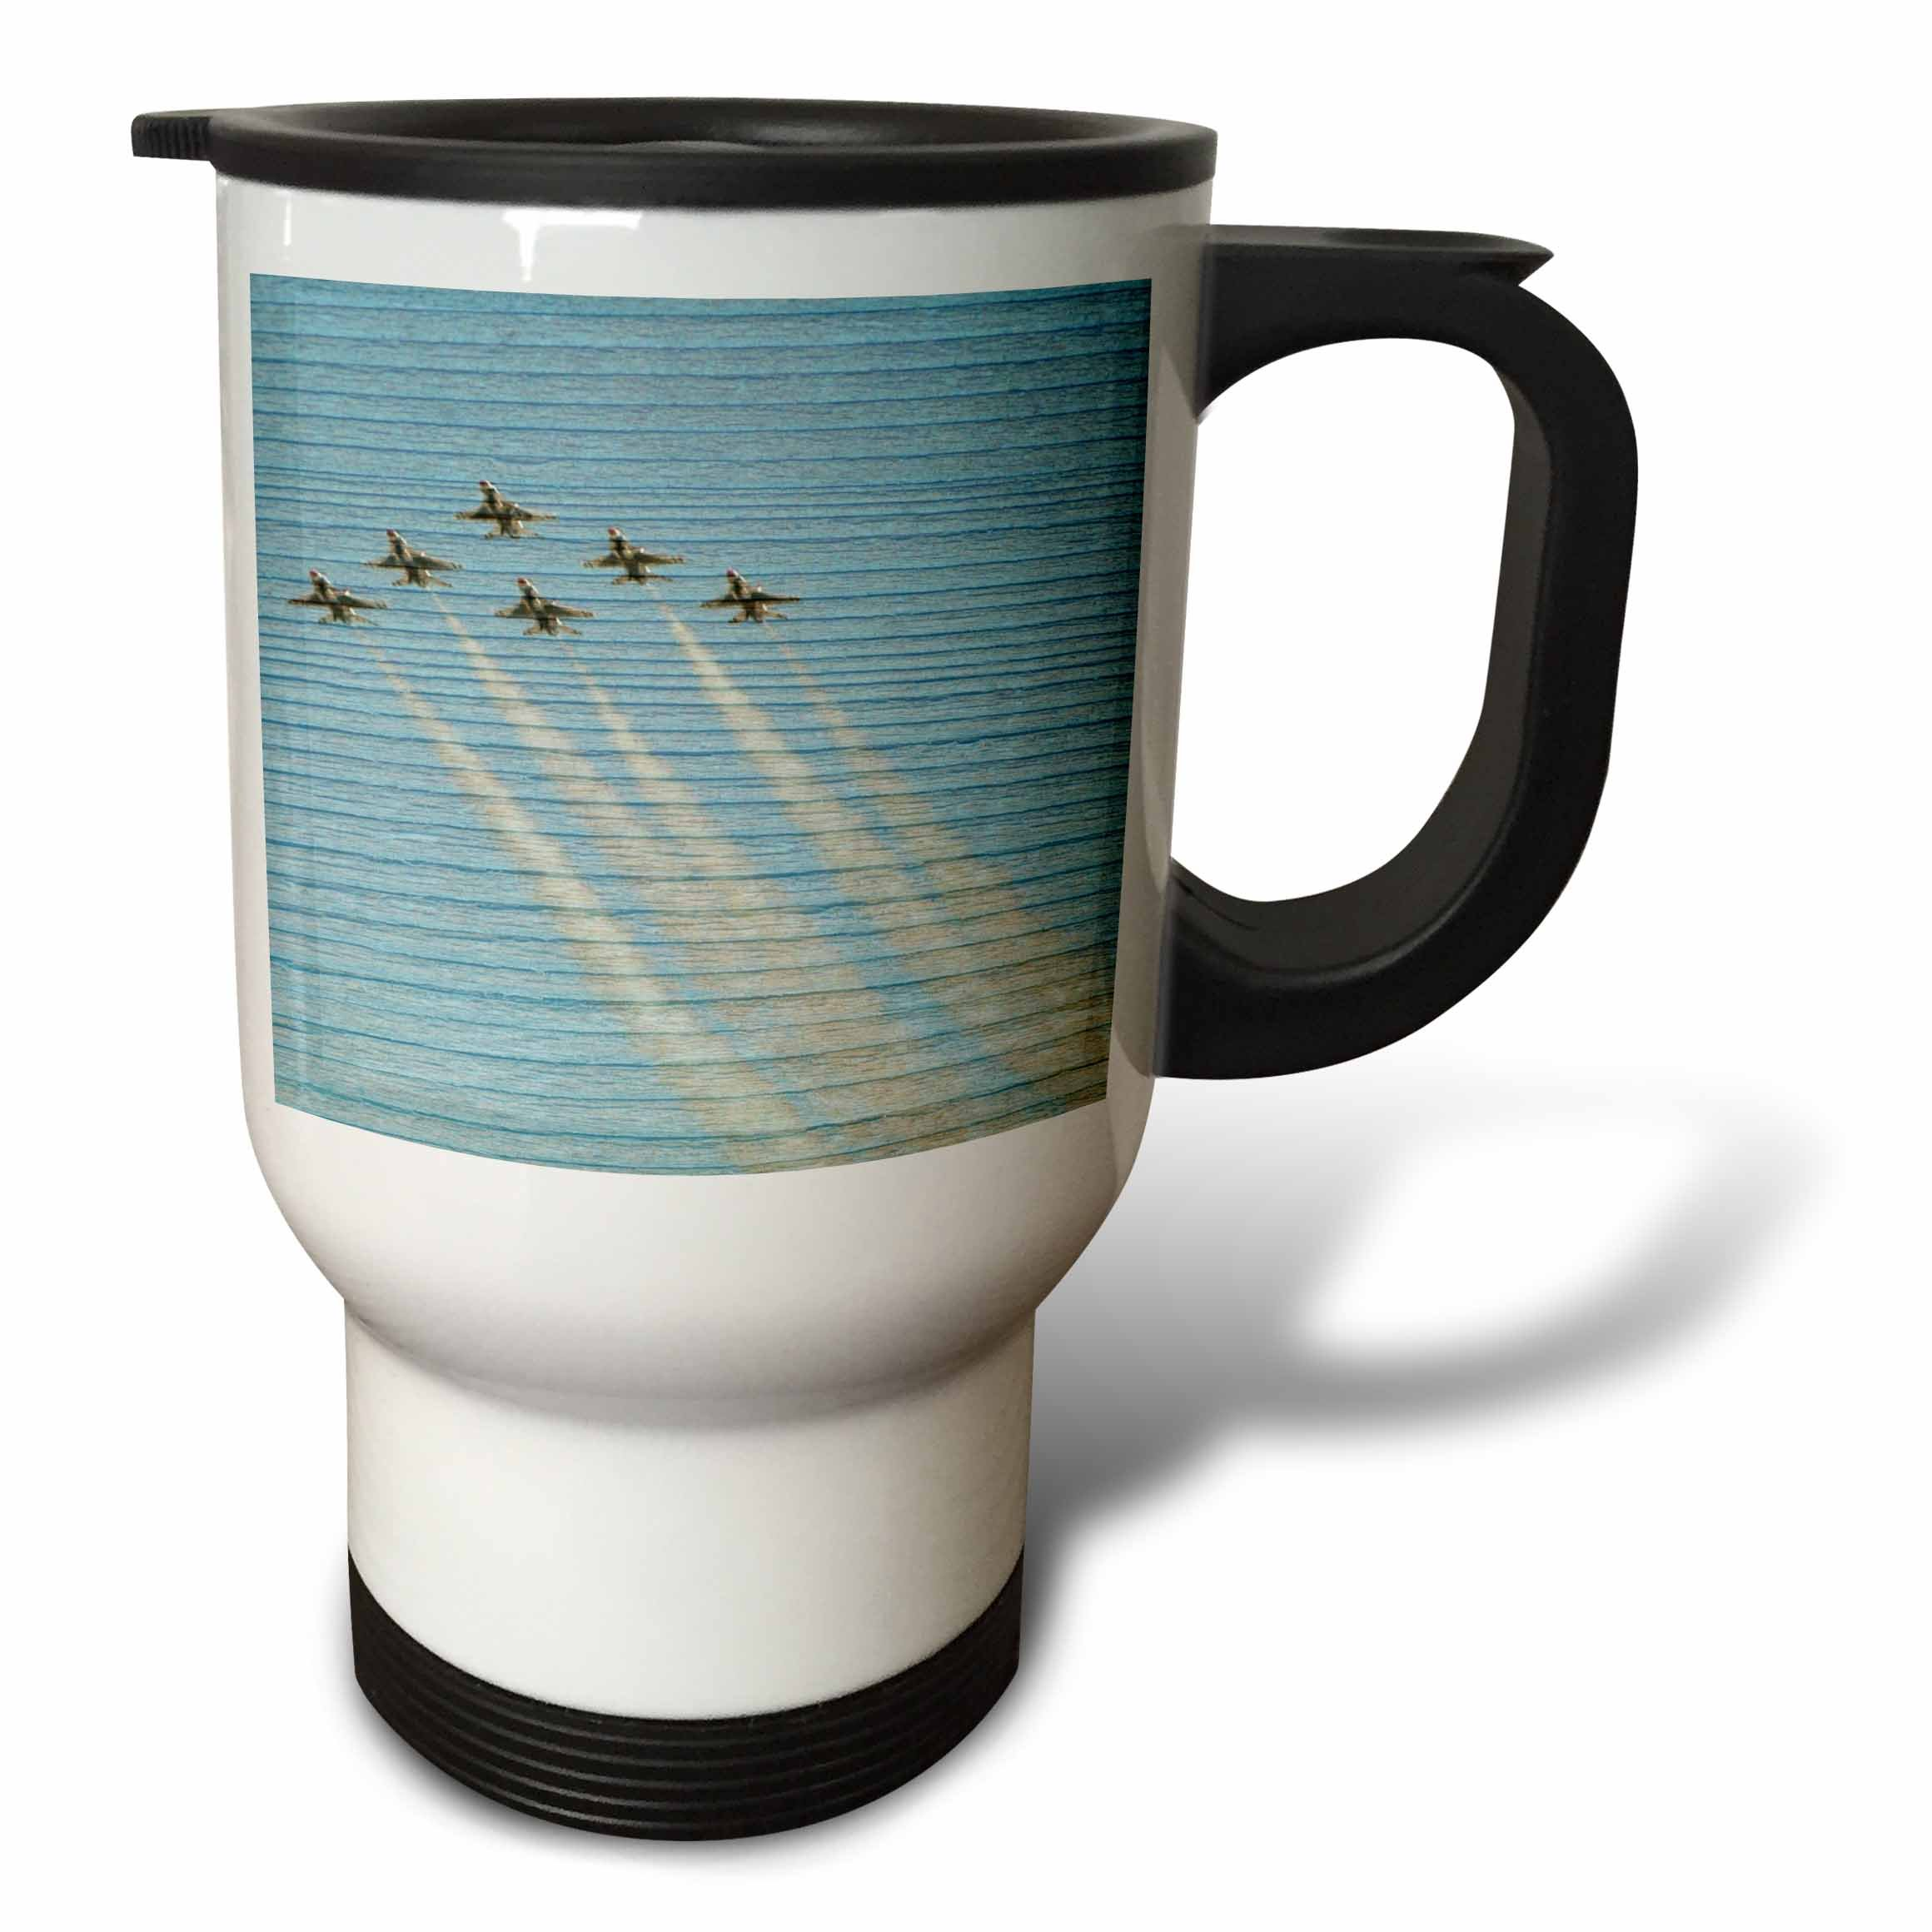 3dRose tm_29481_1'' Wood Airplanes in Flight Photography Scenic''Travel'' Travel Mug, 14 oz, Multicolor